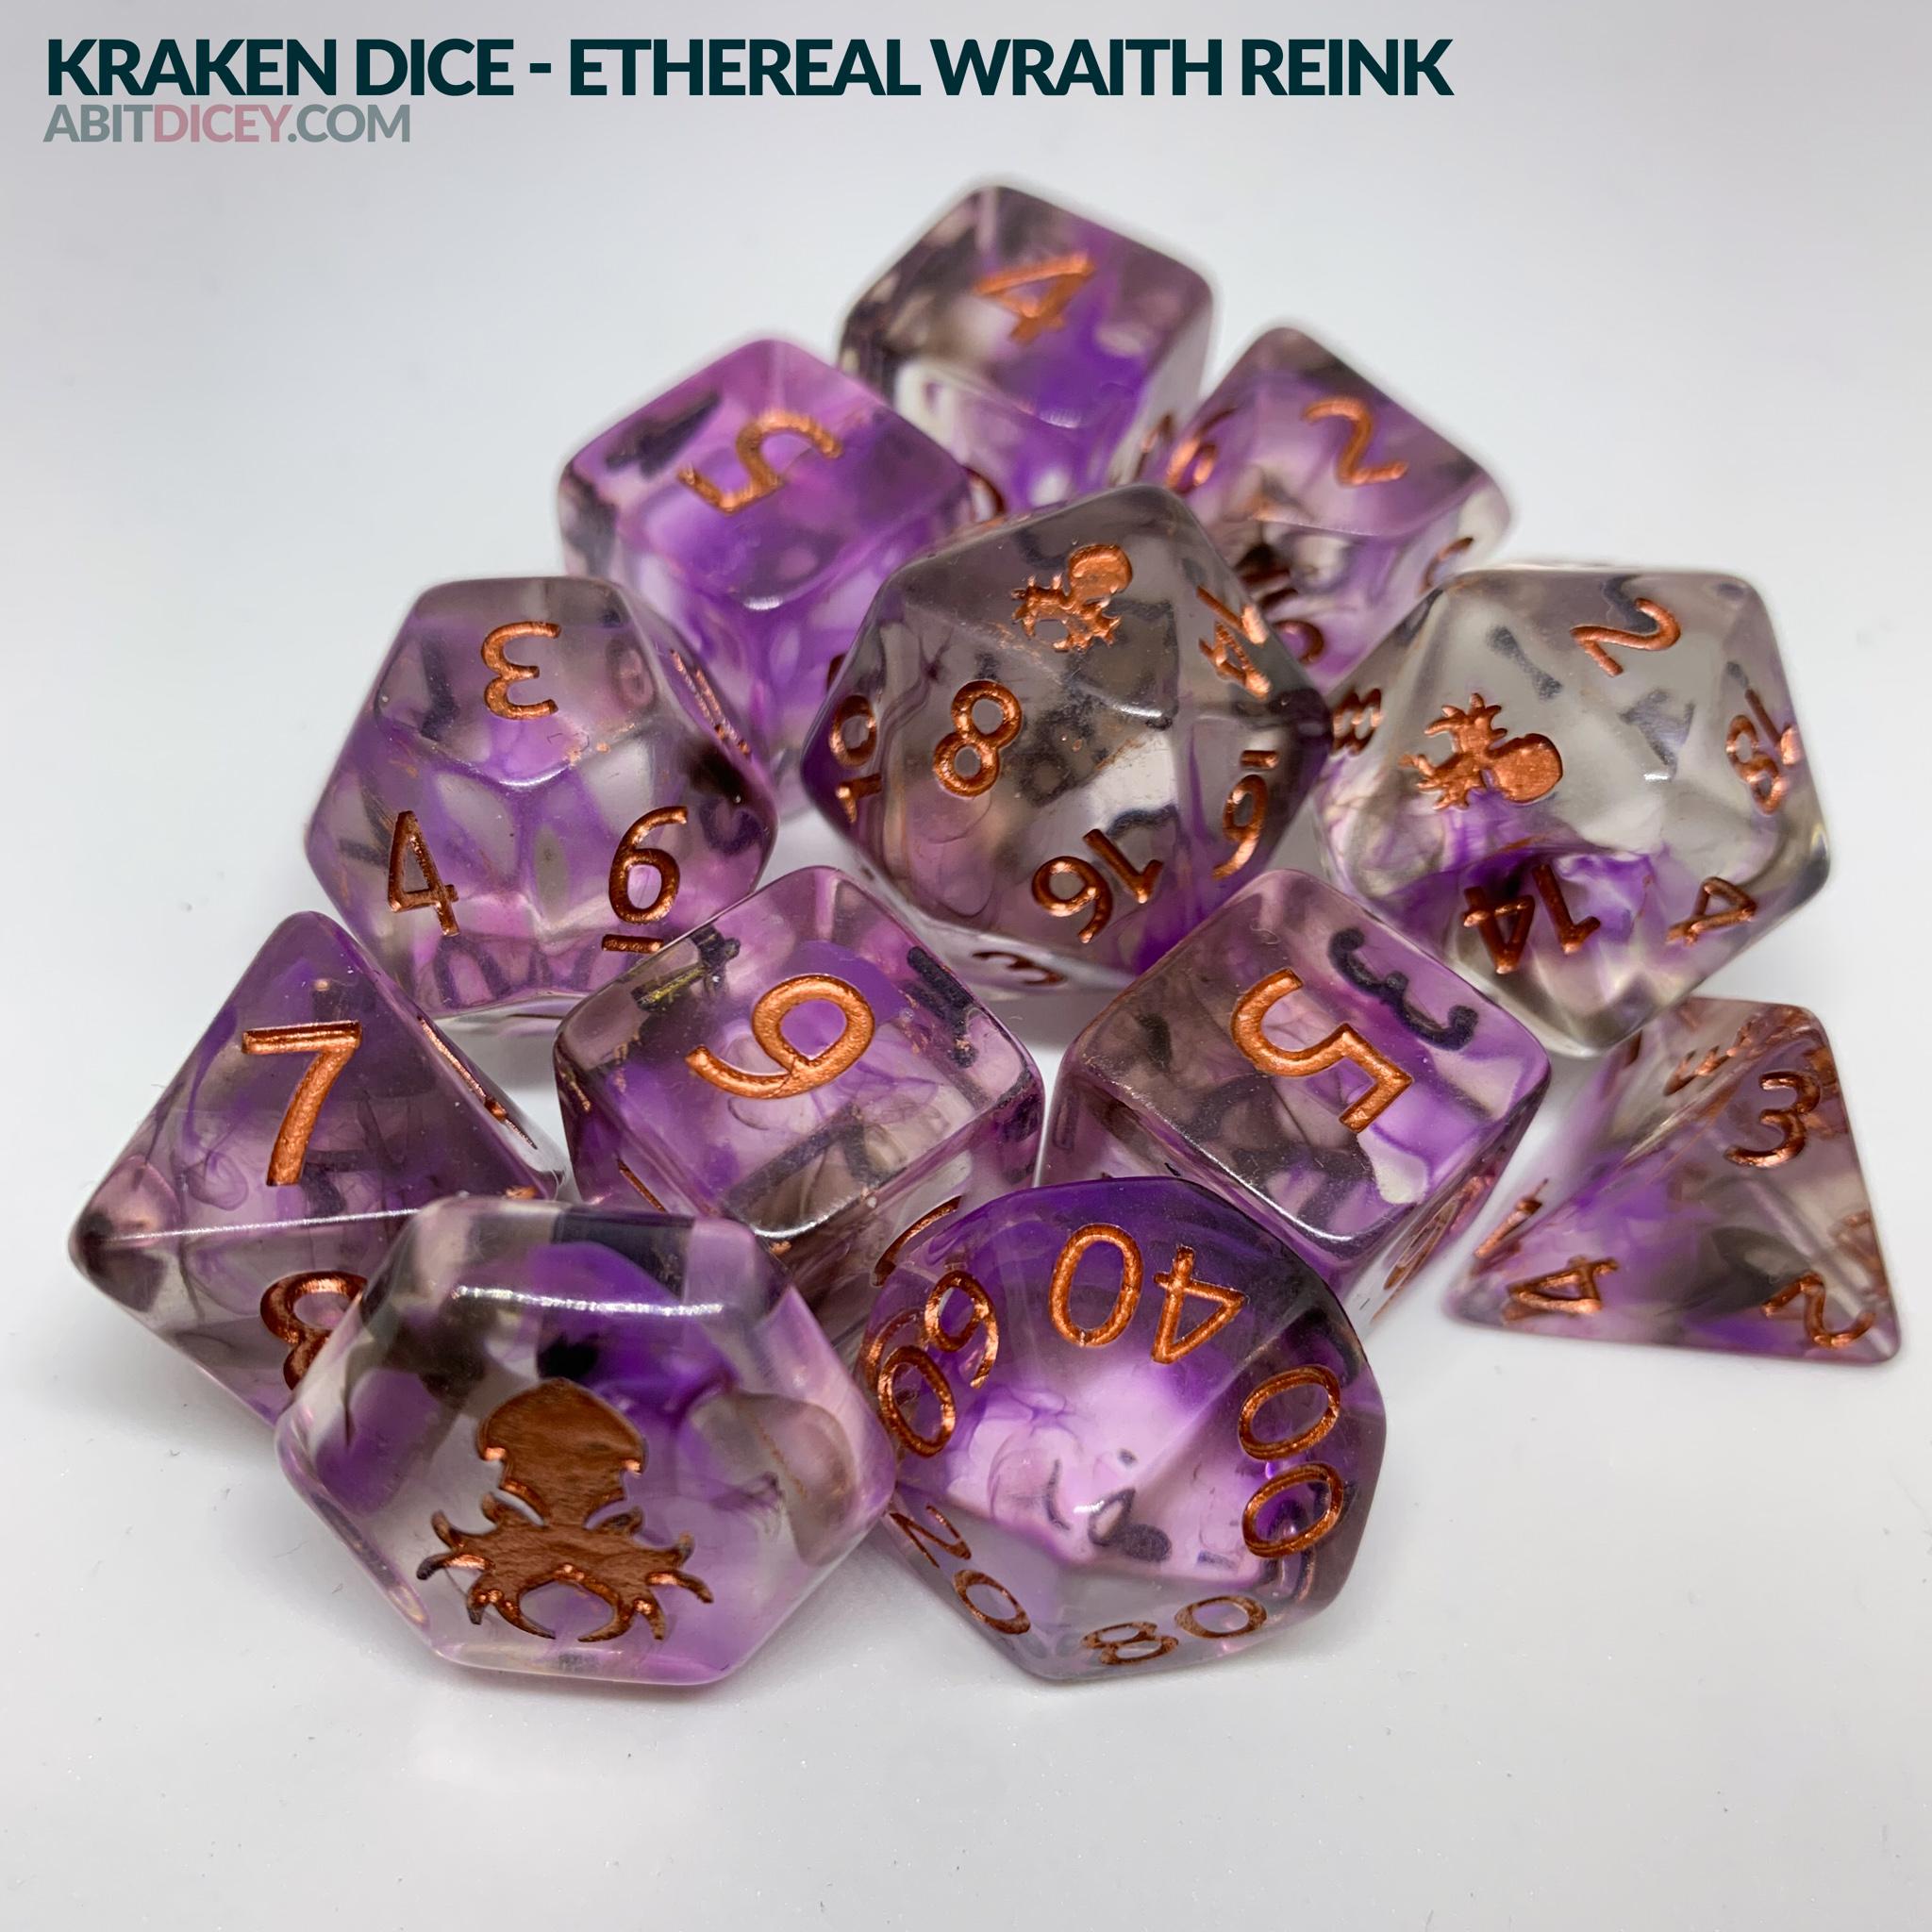 Kraken Dice - Ethereal Wraith Reink